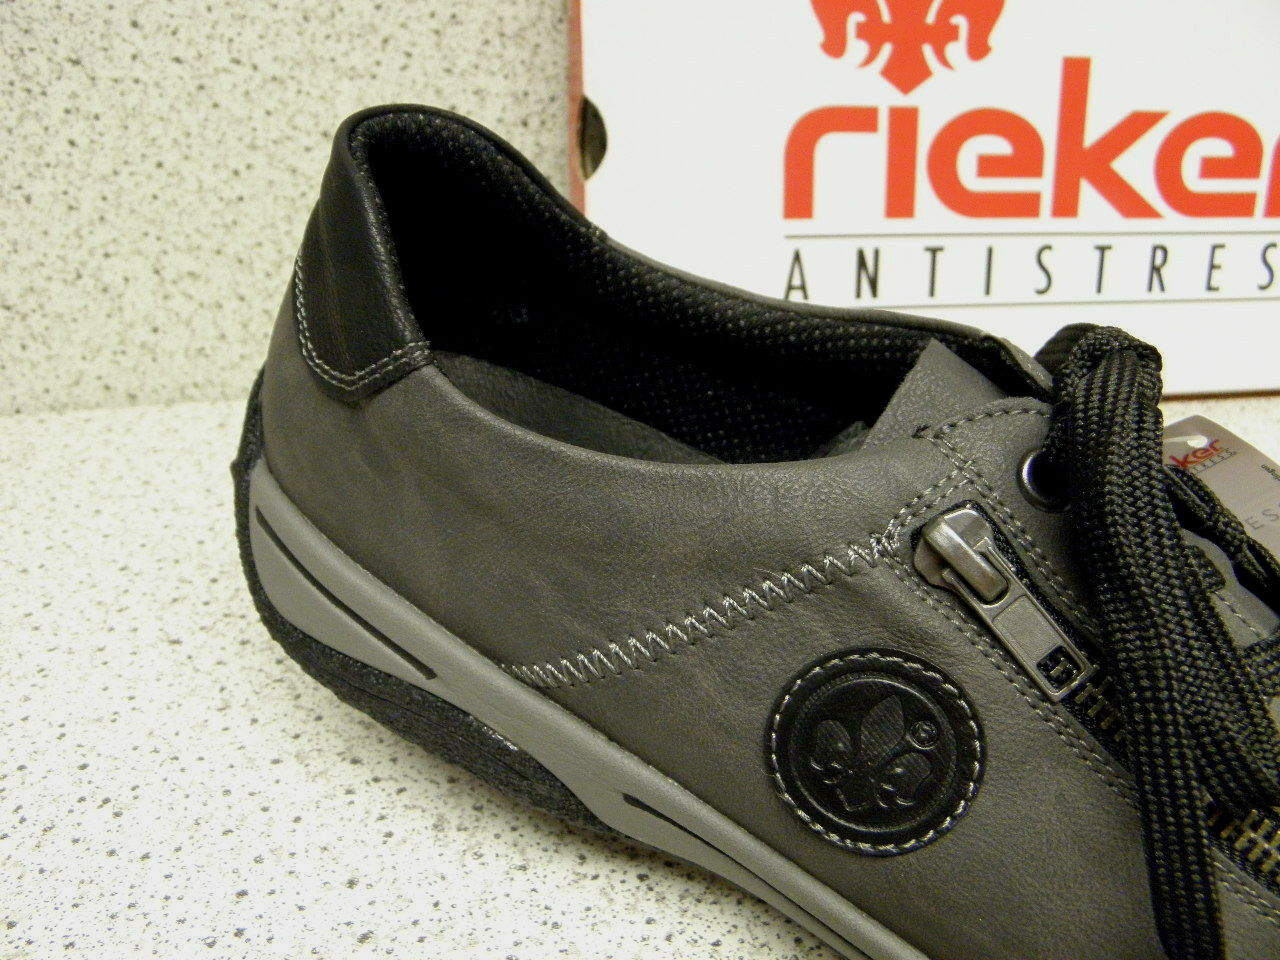 rieker ®  bisher    Schuhe  + gratis Premium - Socken L5224-00 (R390)